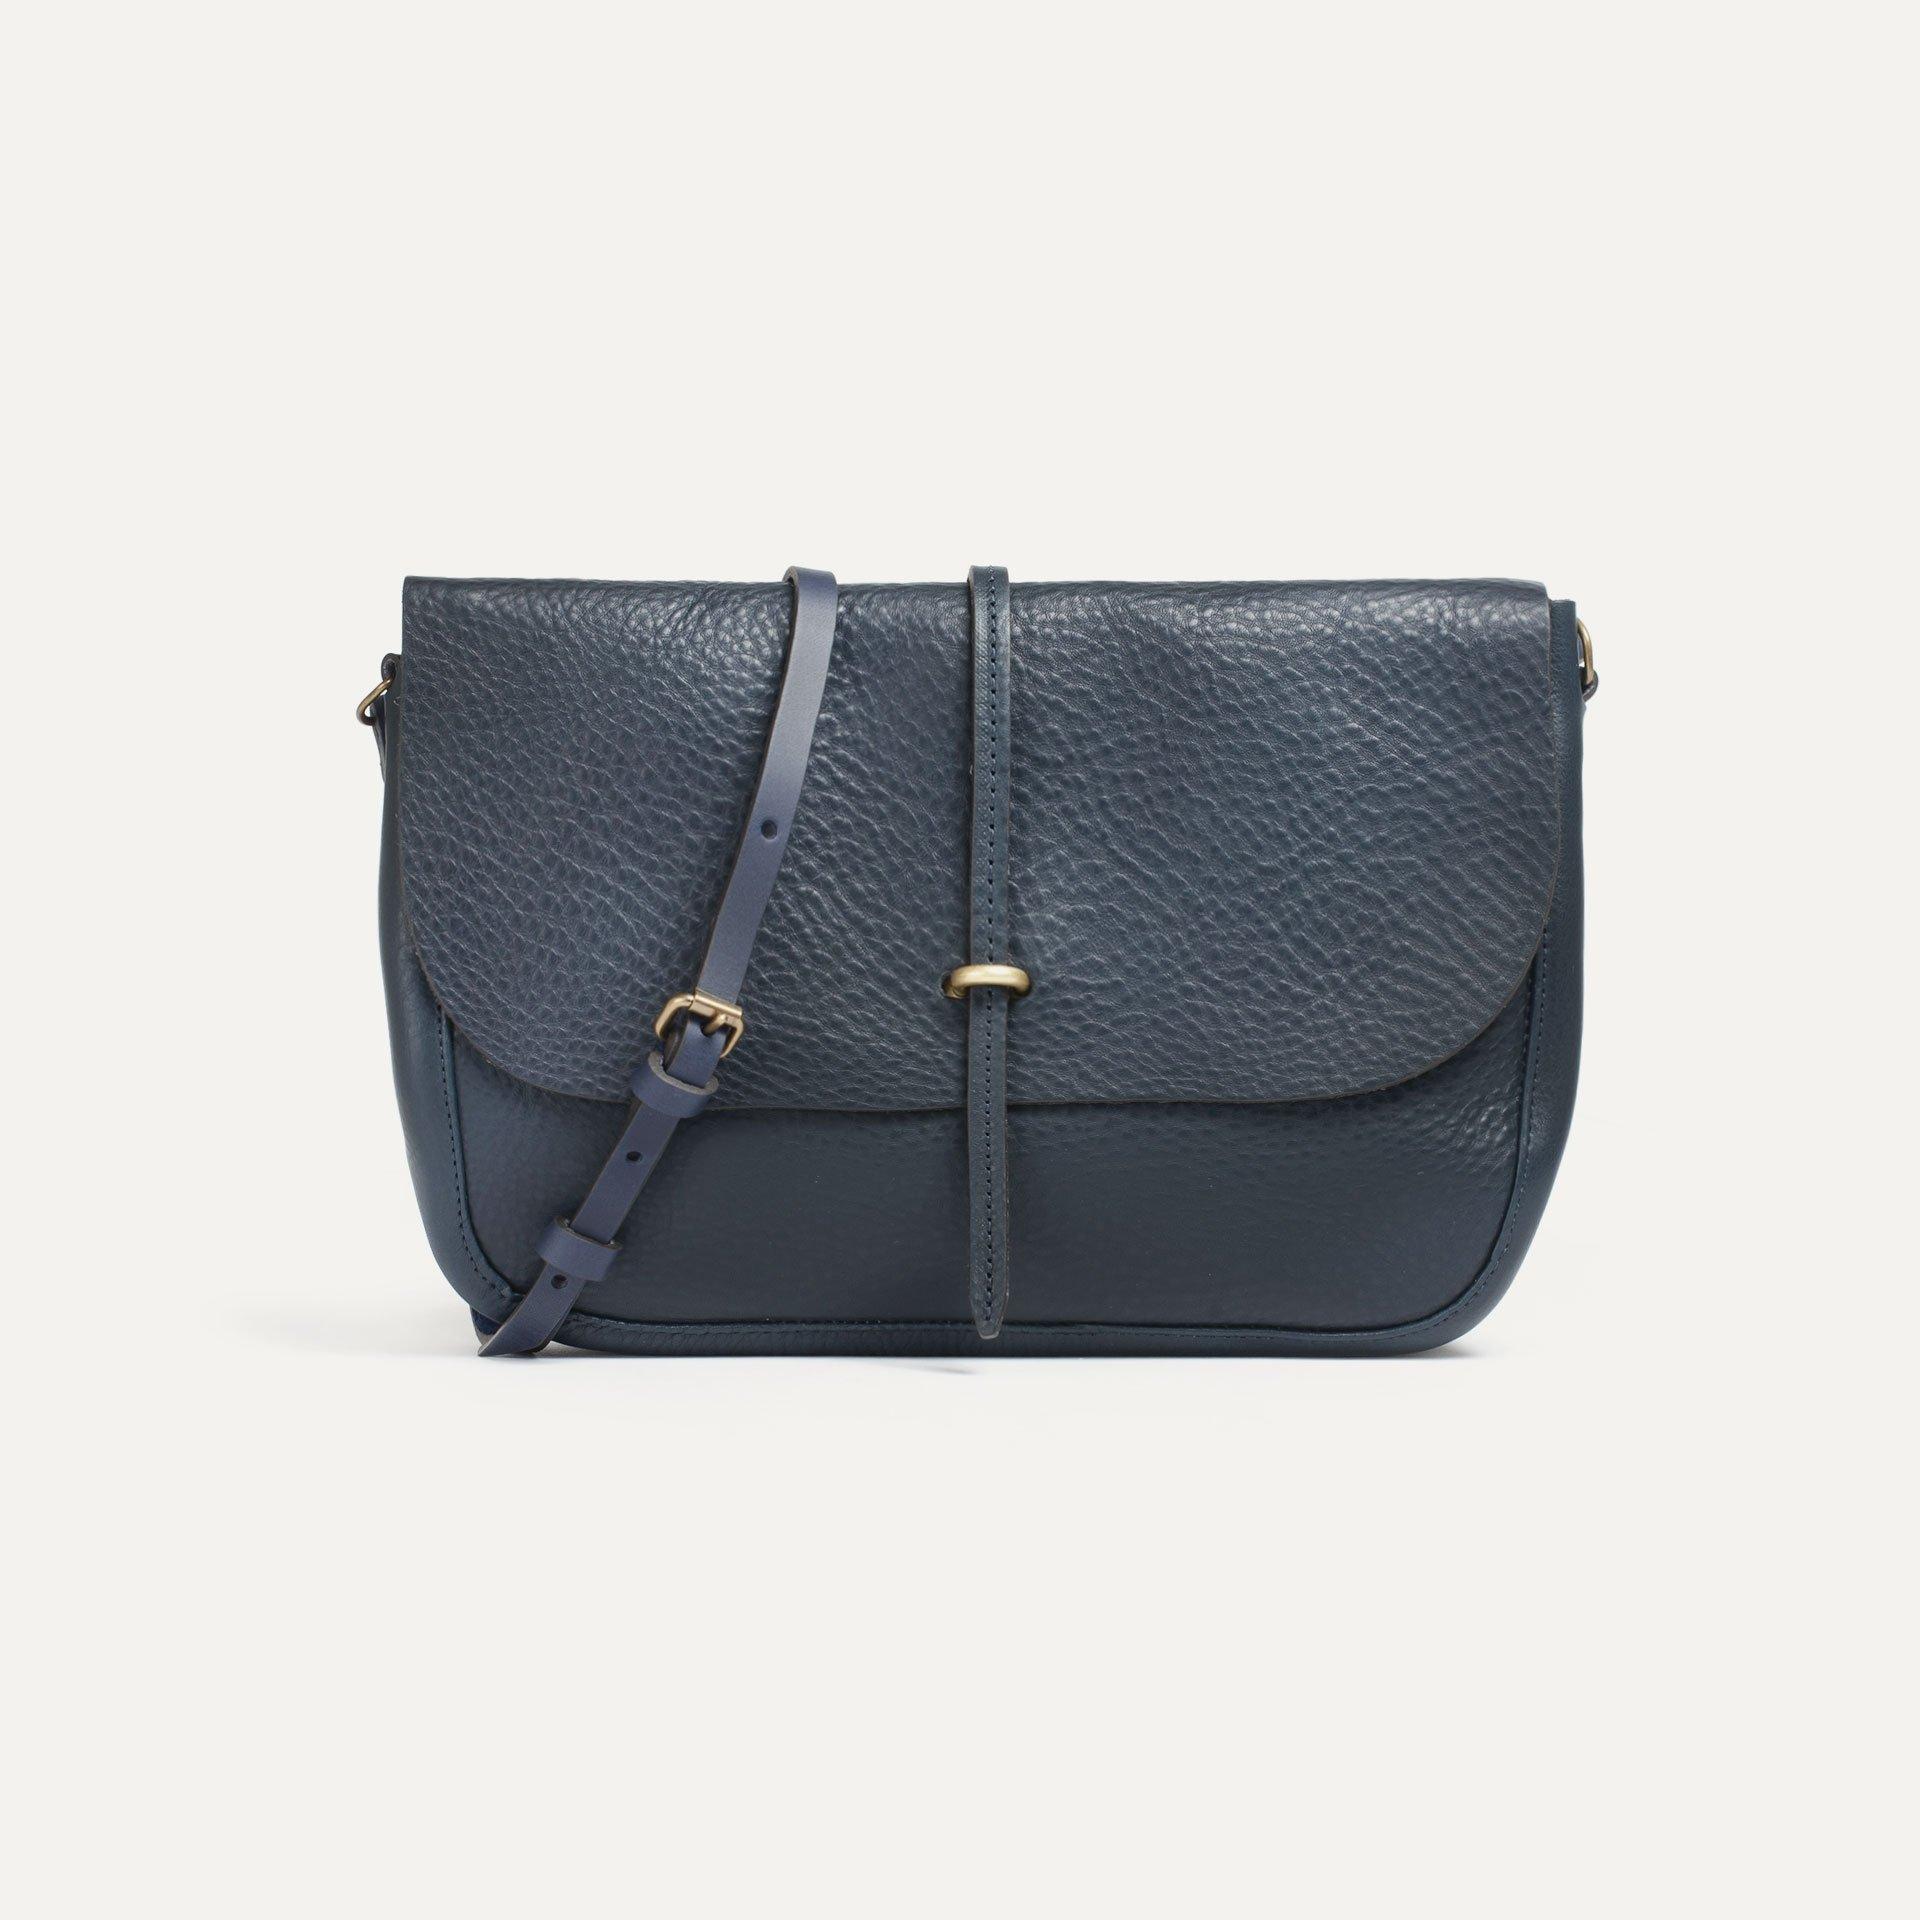 Pastis handbag - Navy Blue (image n°1)